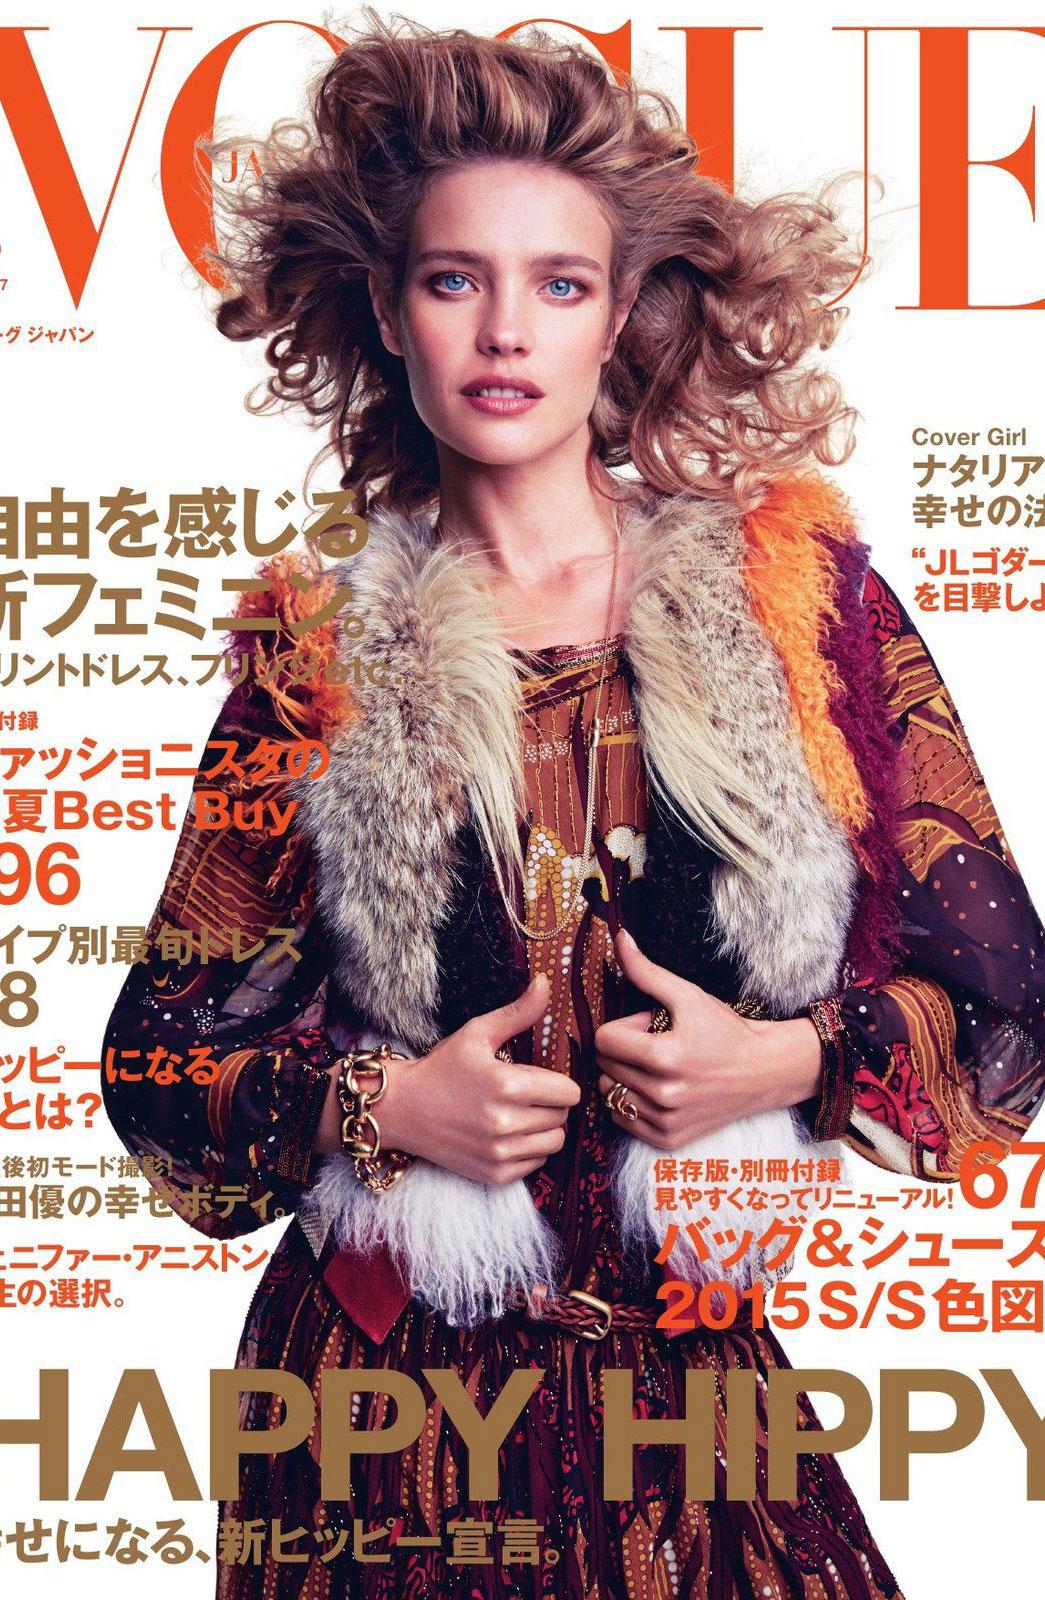 Natalia Vodianova in Vogue Japan March 2015